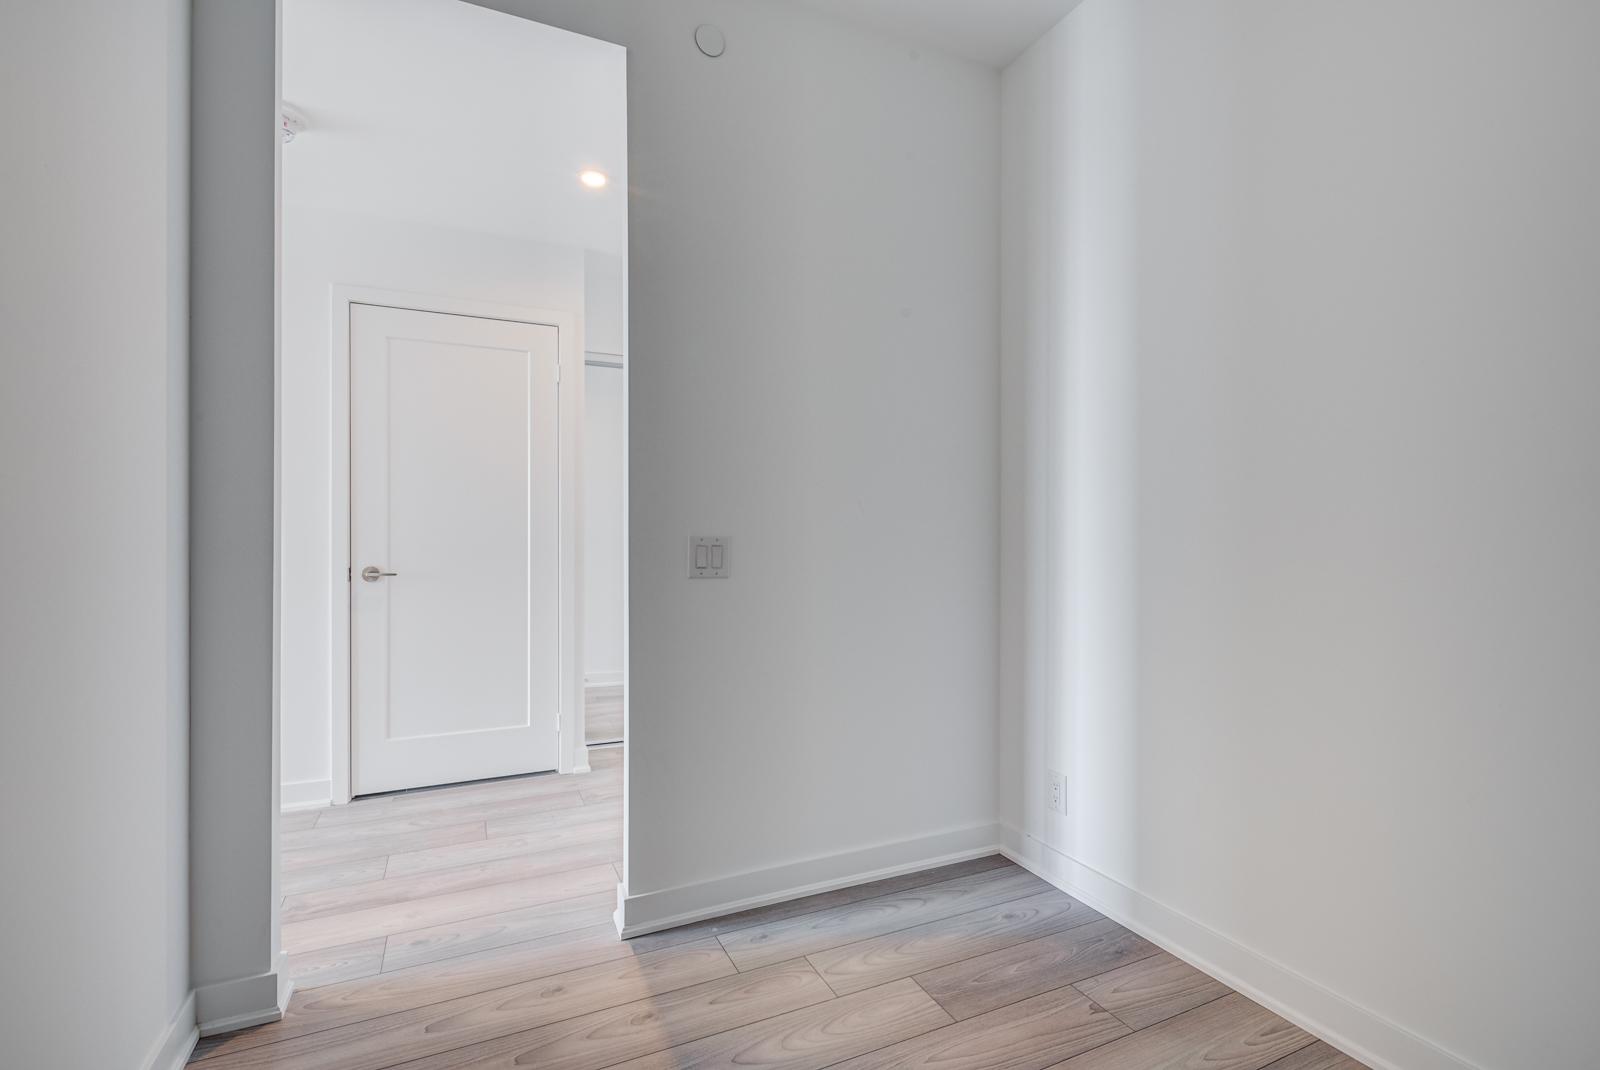 Empty condo den with laminate floors and gray walls.